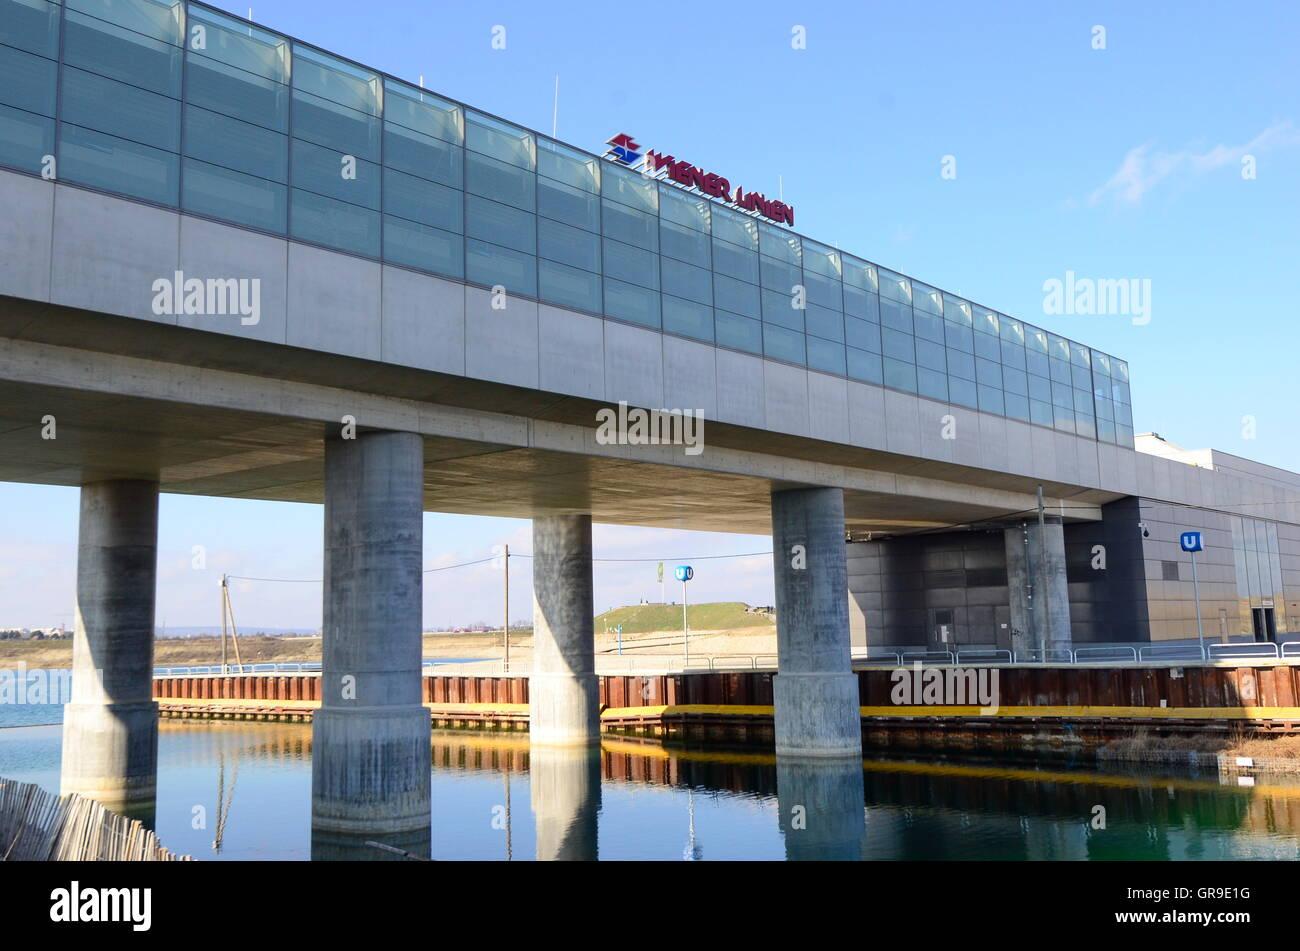 Wiener Linien, Urban Transport Operation The Capital Vienna - Stock Image